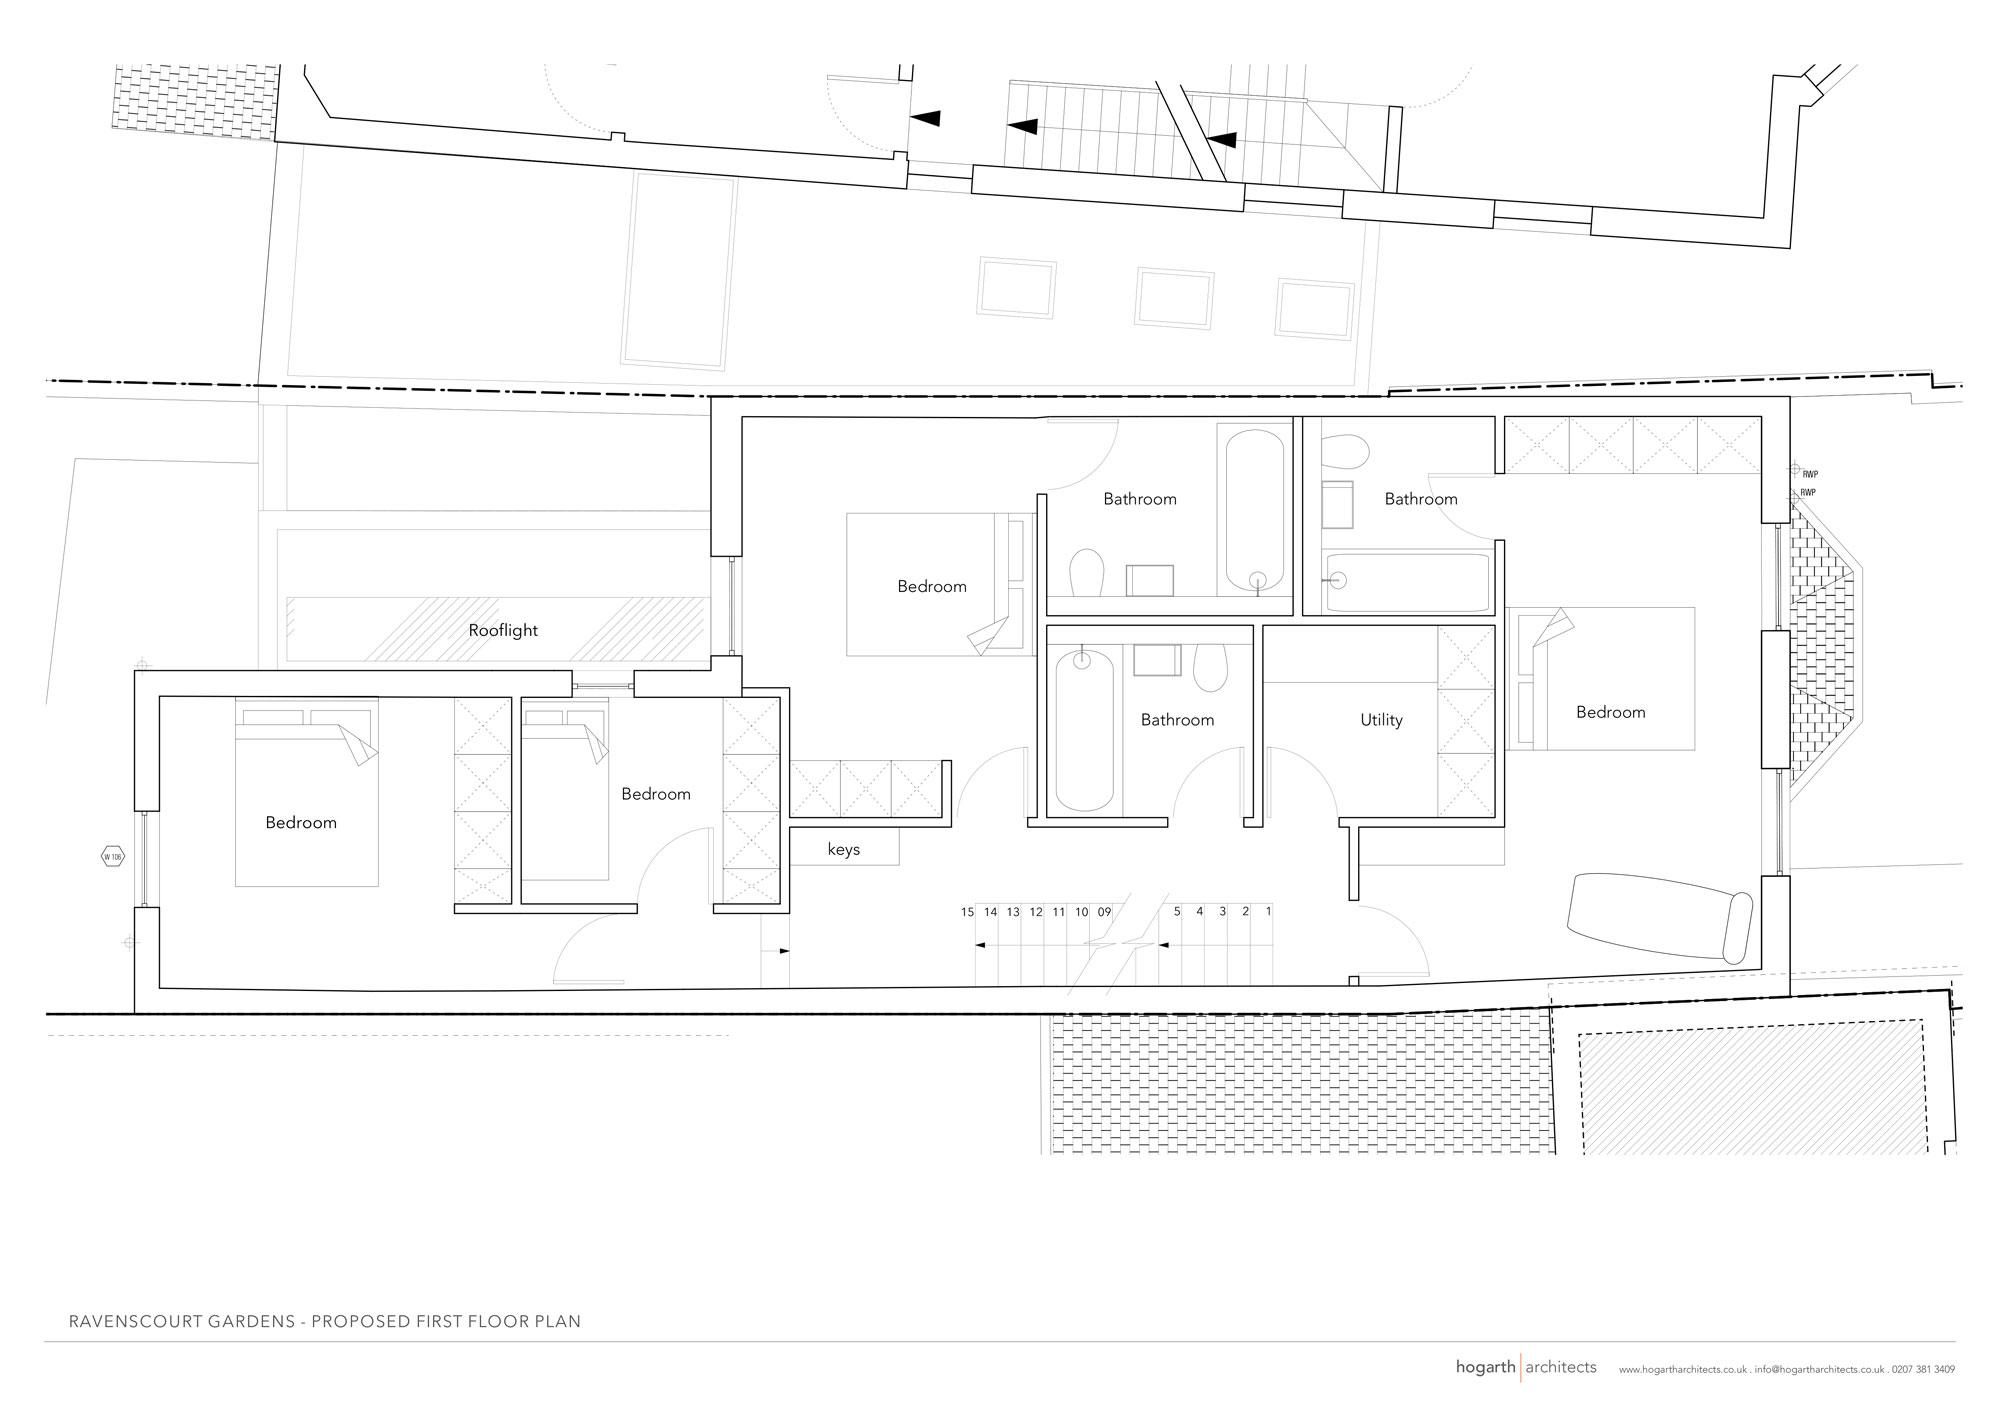 L(-2)372 Proposed First Floor Plan.jpg